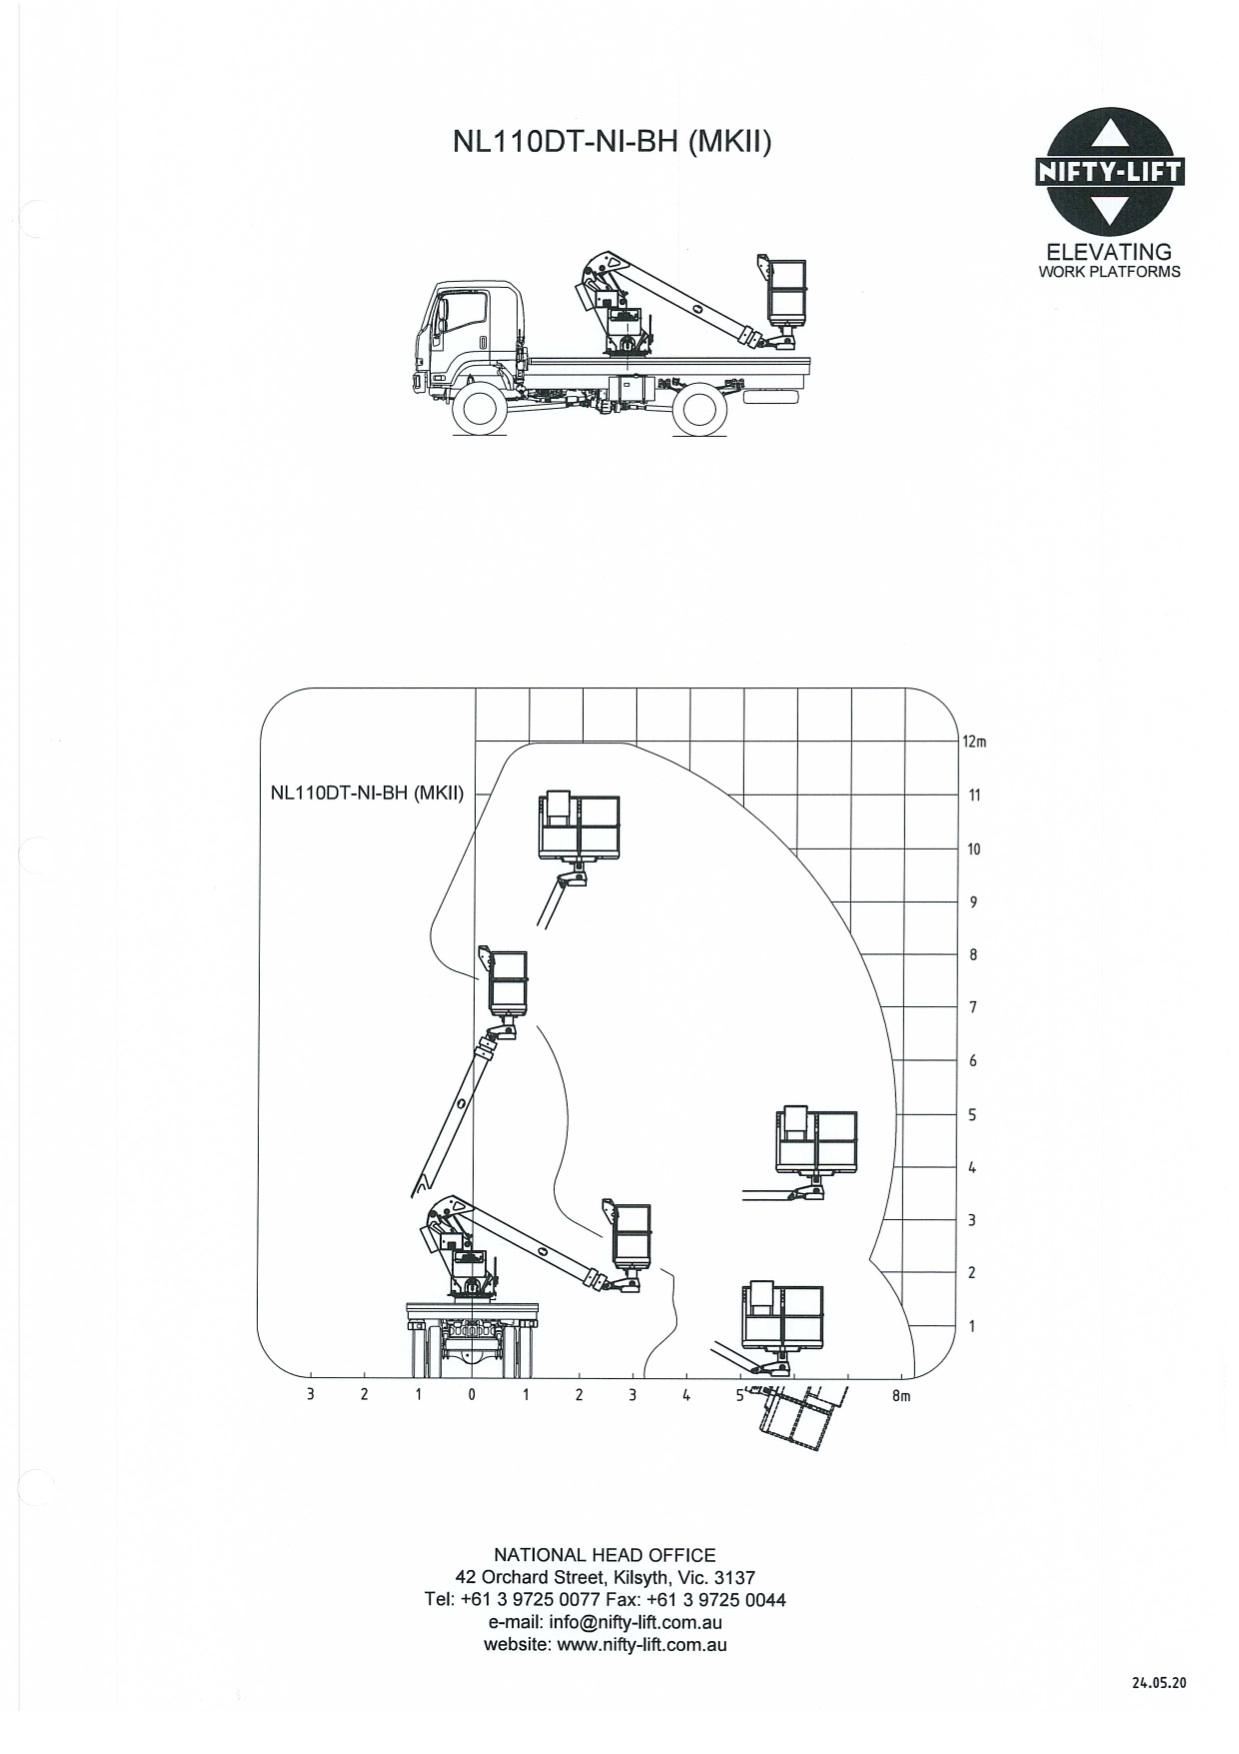 2LIFTU-Hirail-Cherry-Picker-EWP-4WD-Dual-Cab-Hino-Radius-Chart-1.jpg